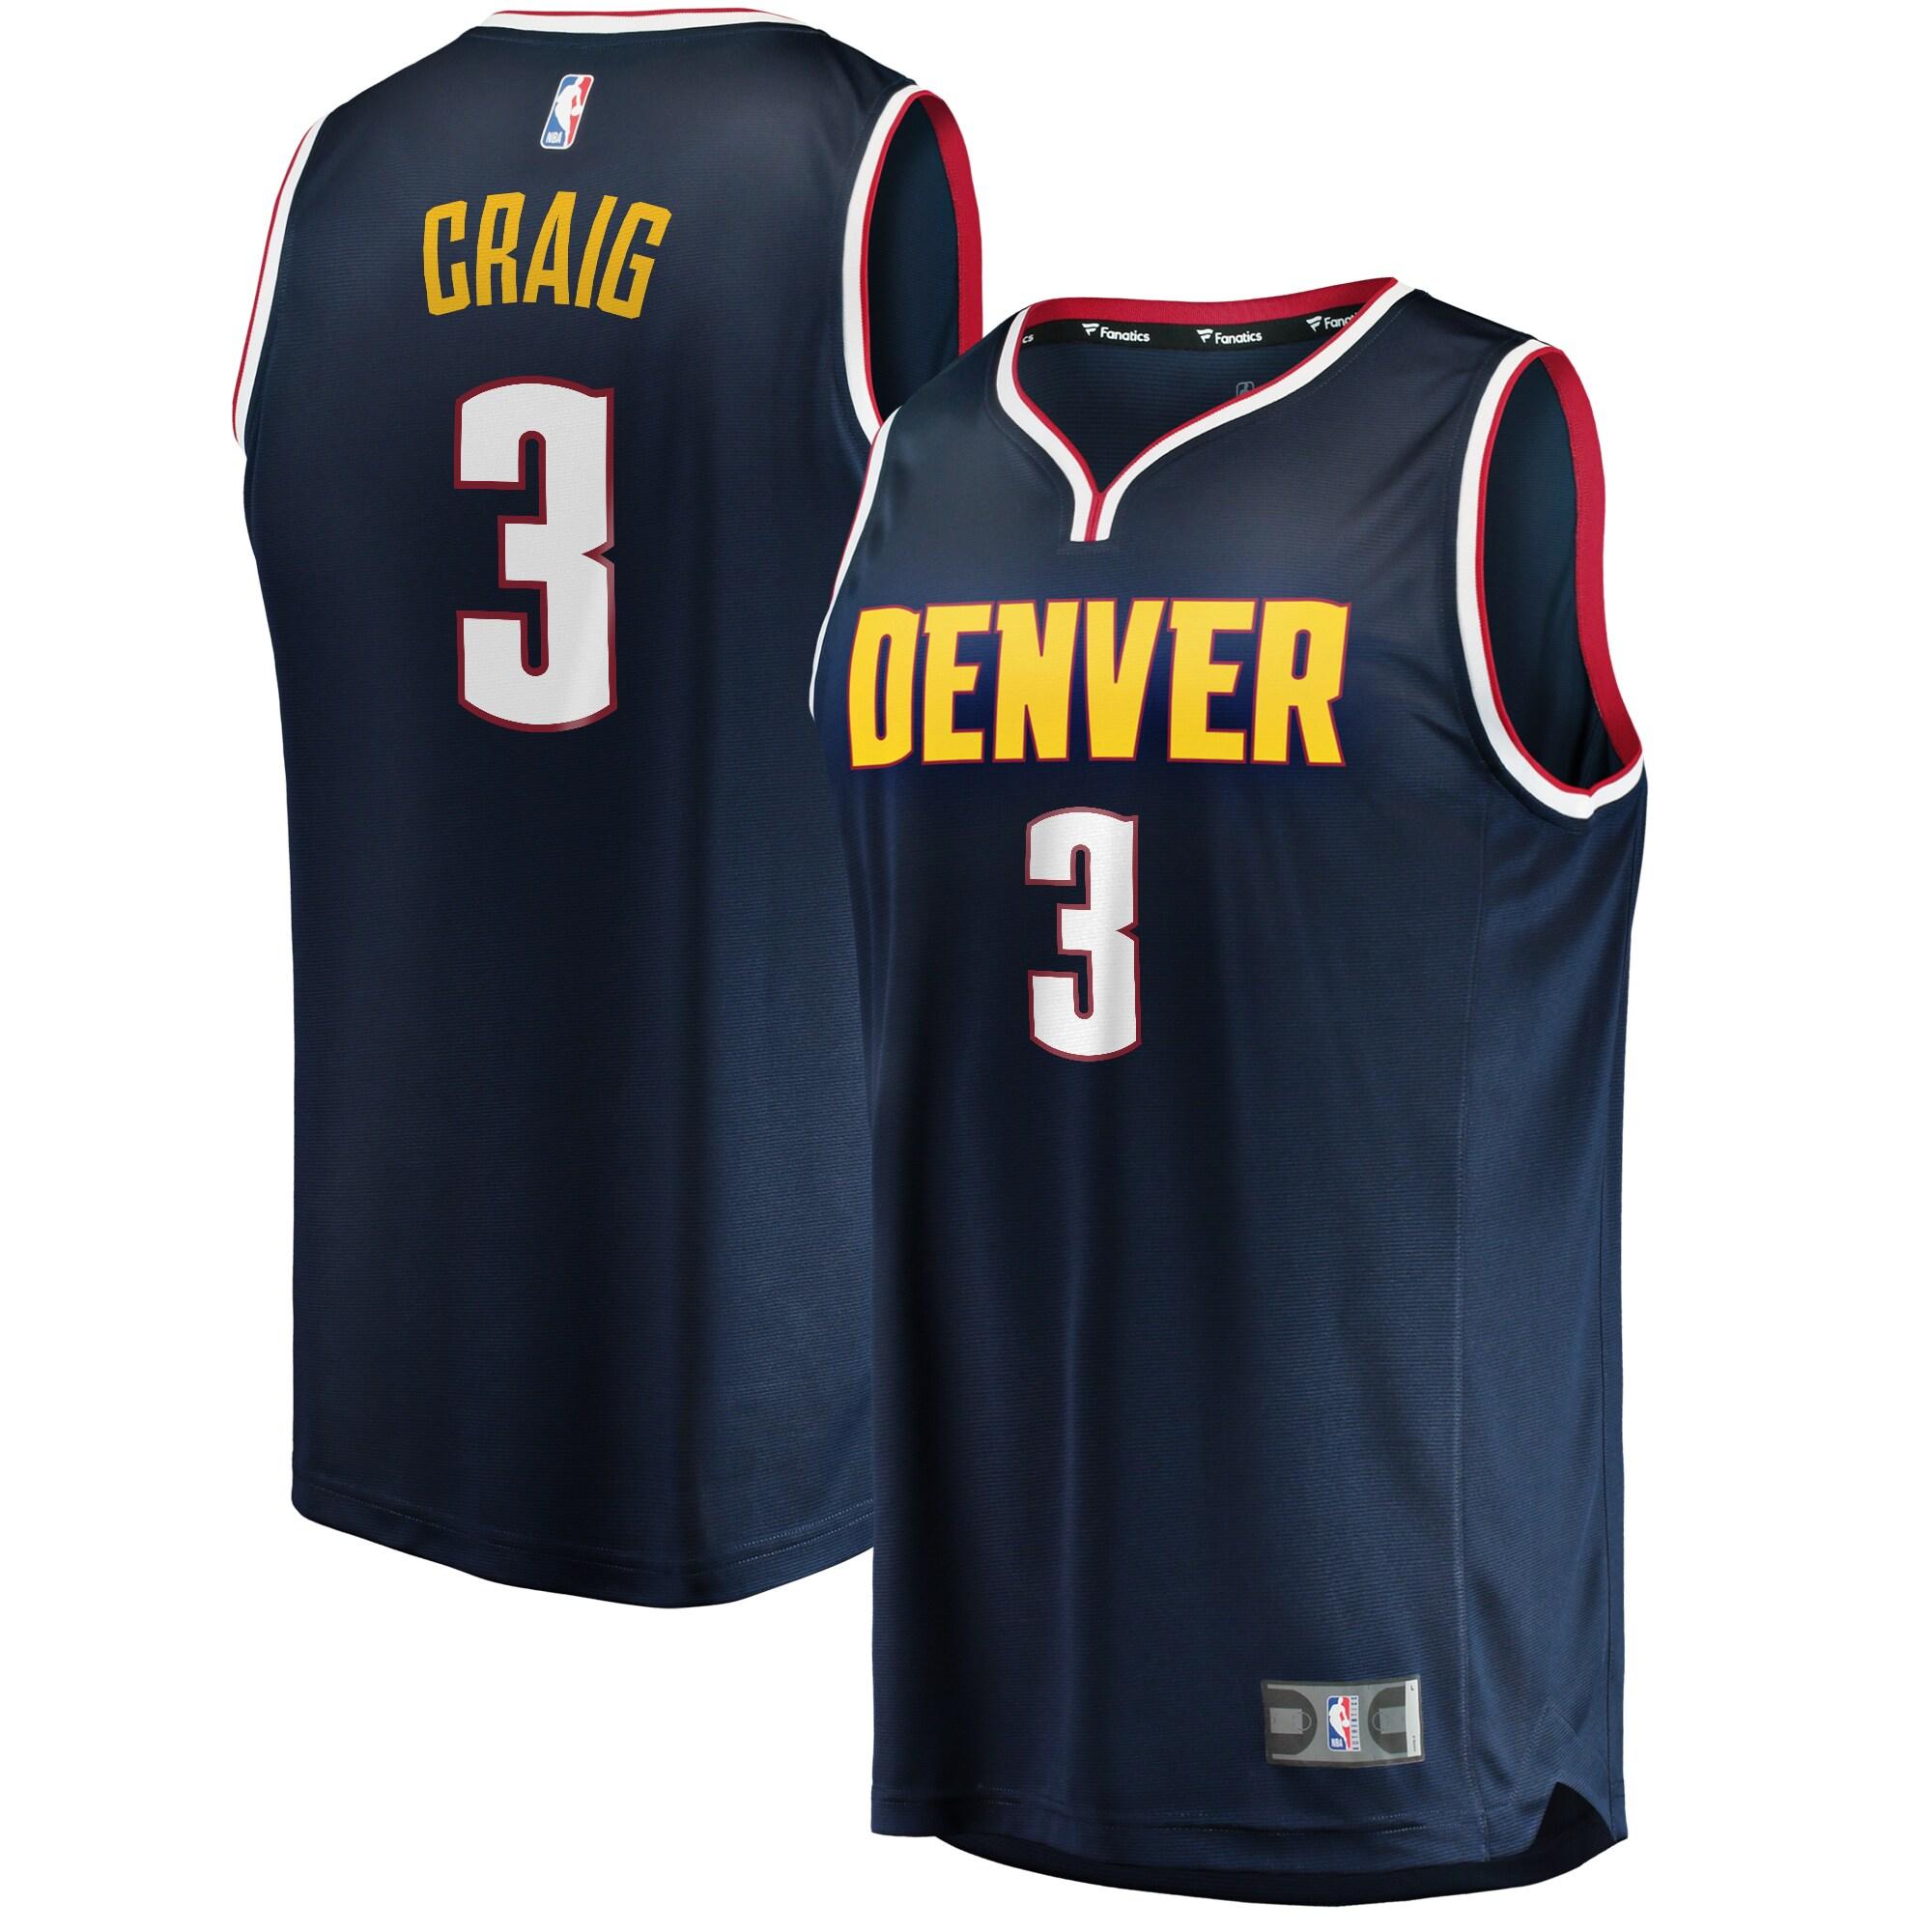 Torrey Craig Denver Nuggets Fanatics Branded Youth Fast Break Player Jersey - Icon Edition - Navy